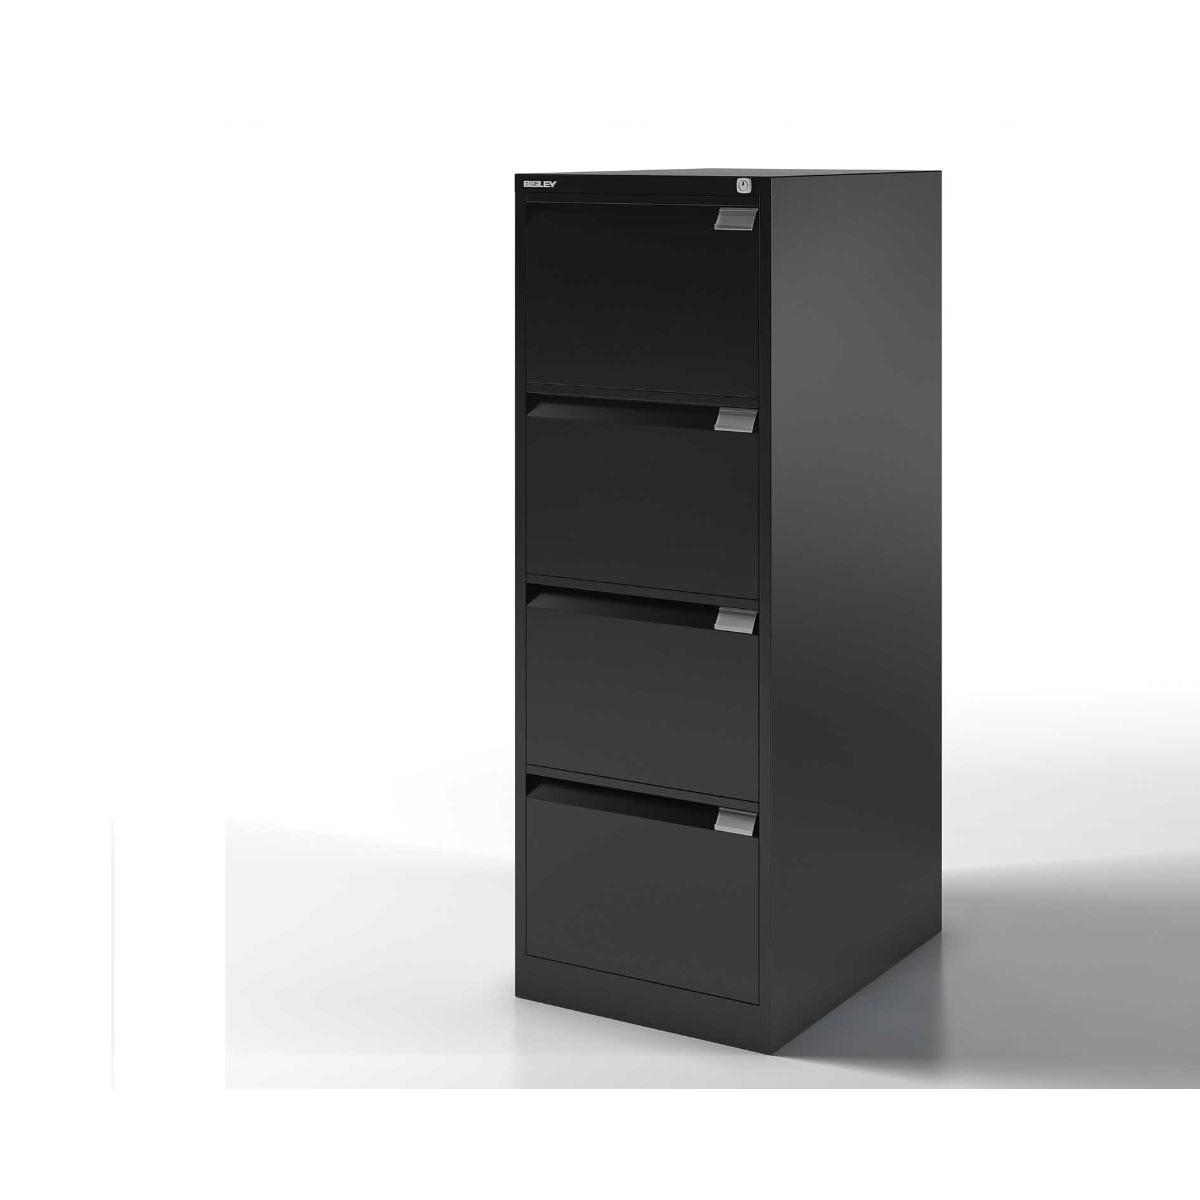 Filing Cabinets Storage & Shelving Furniture & Storage - Ryman